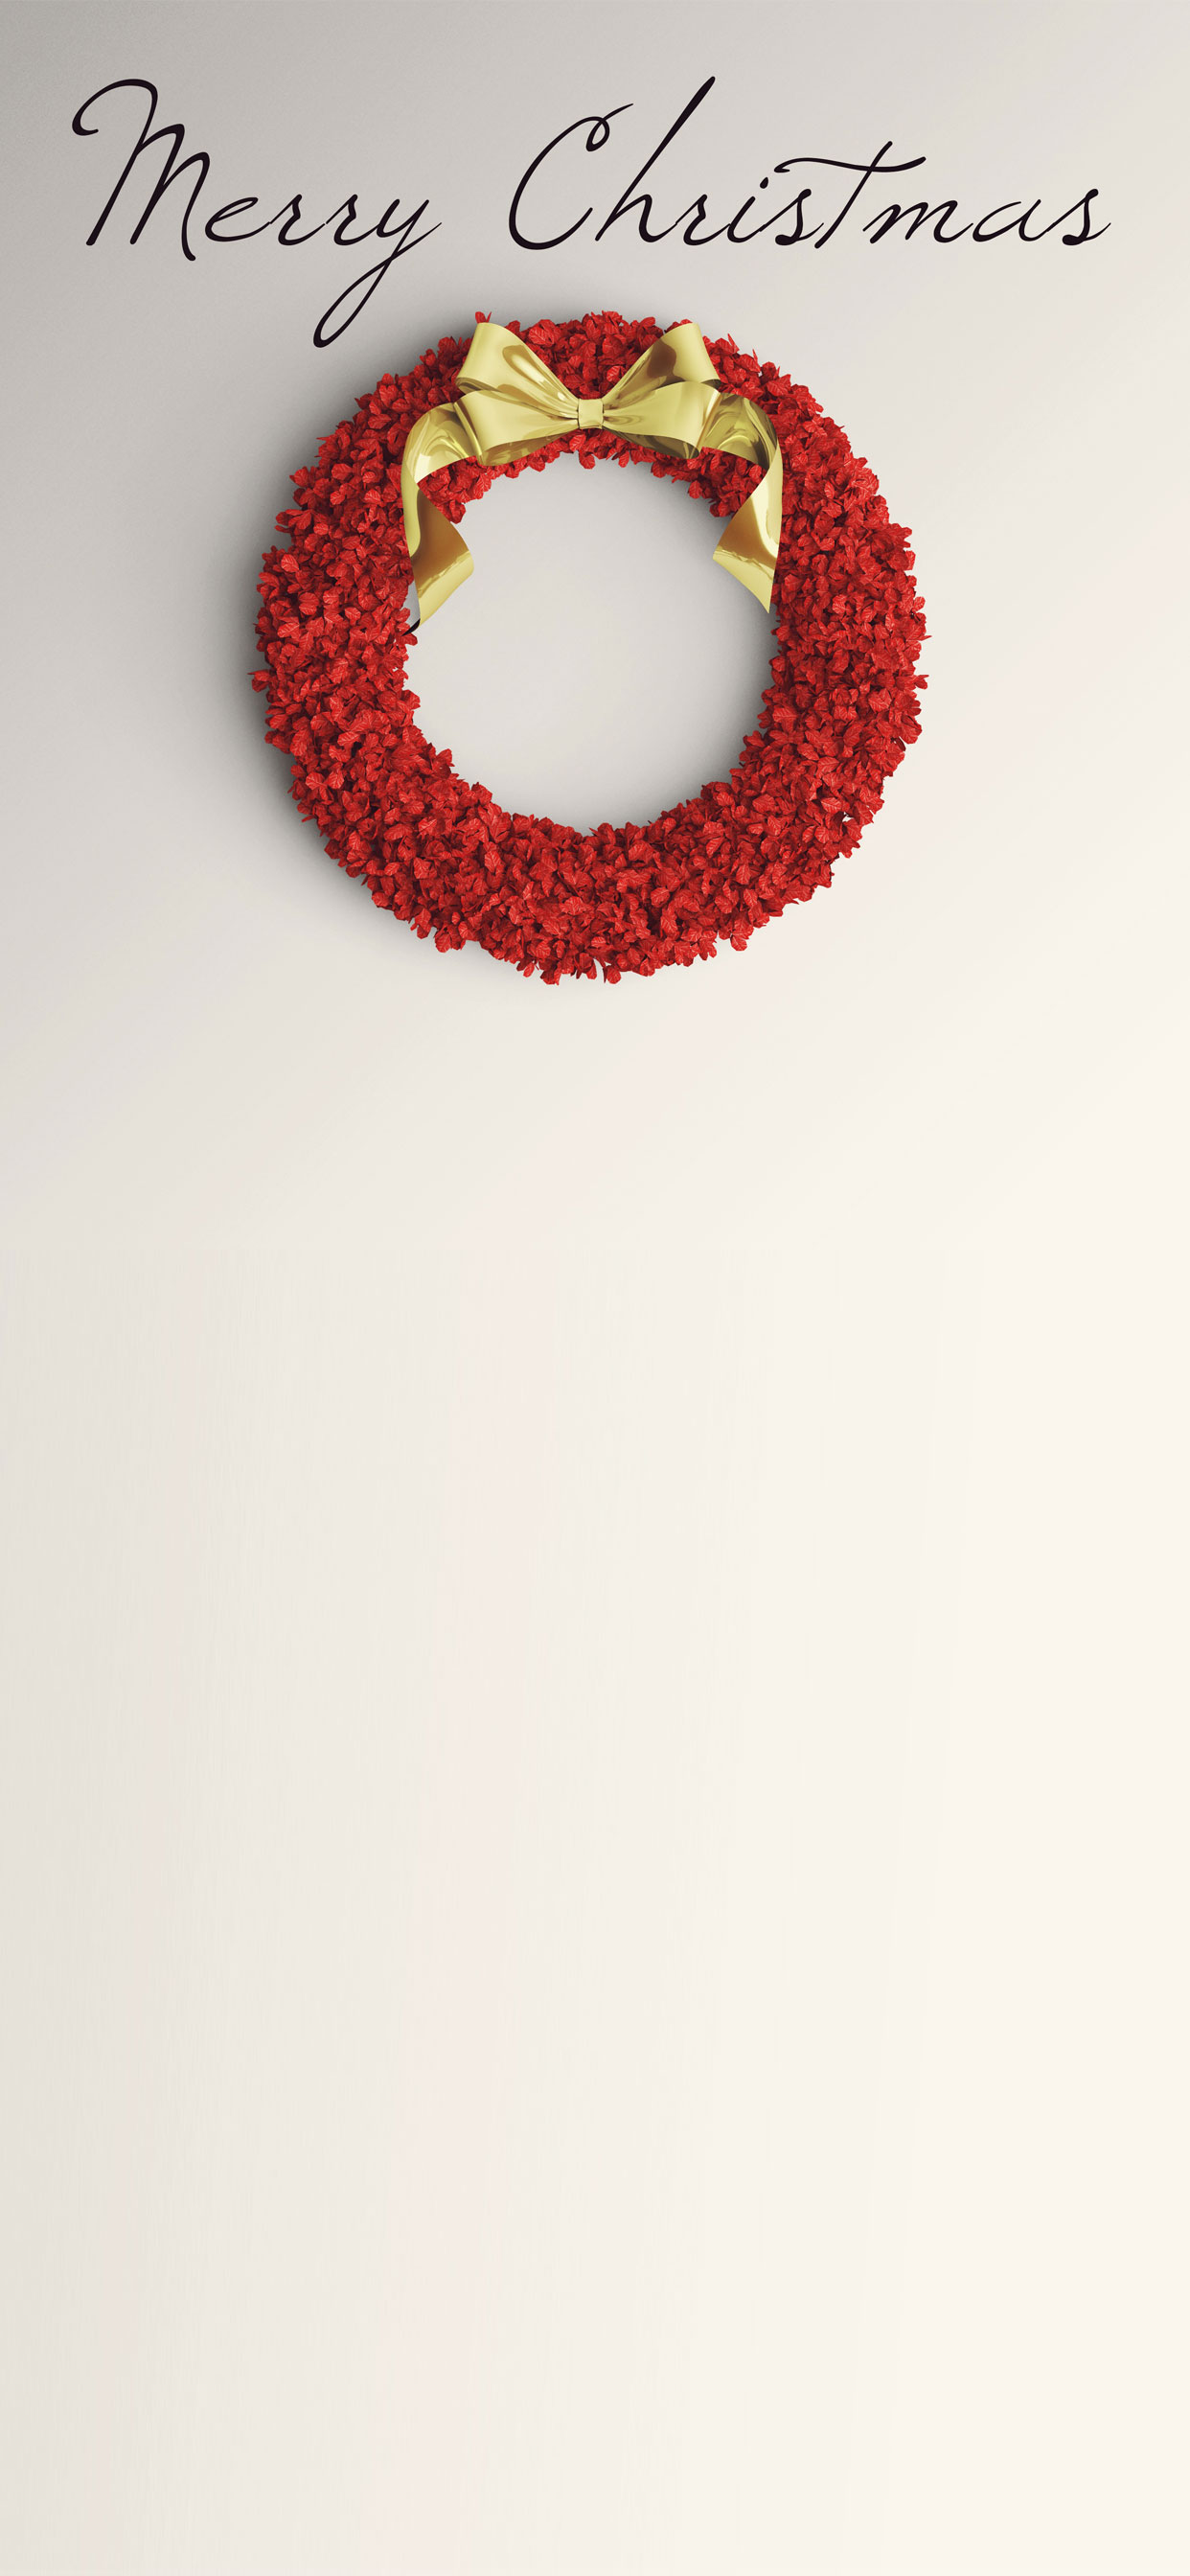 30 Beautiful Iphone Xs Xs Max Christmas Wallpapers